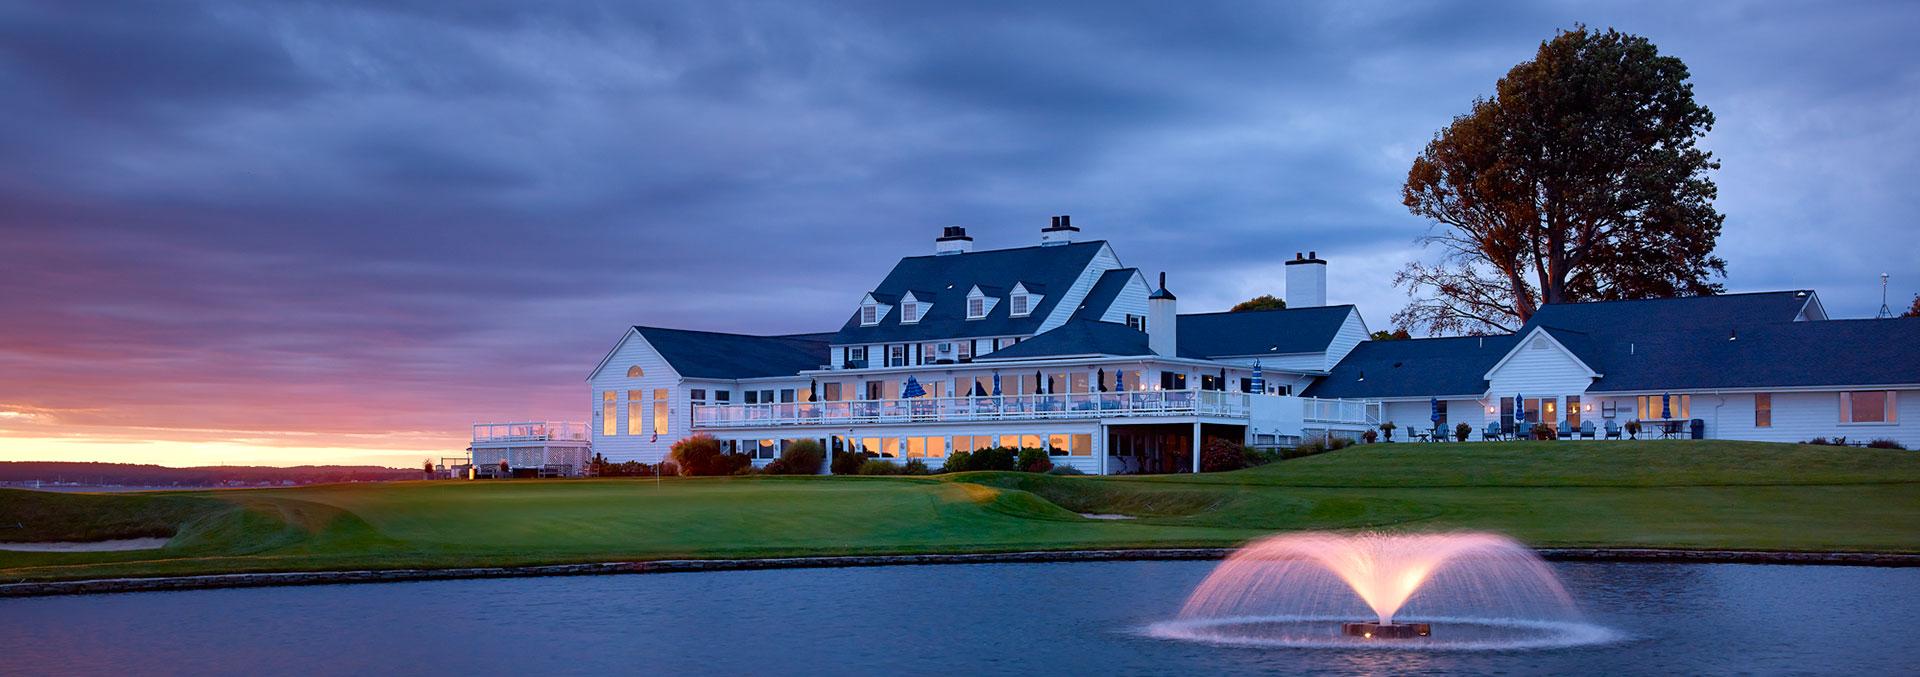 Rhode Island Country Clubs Weddings